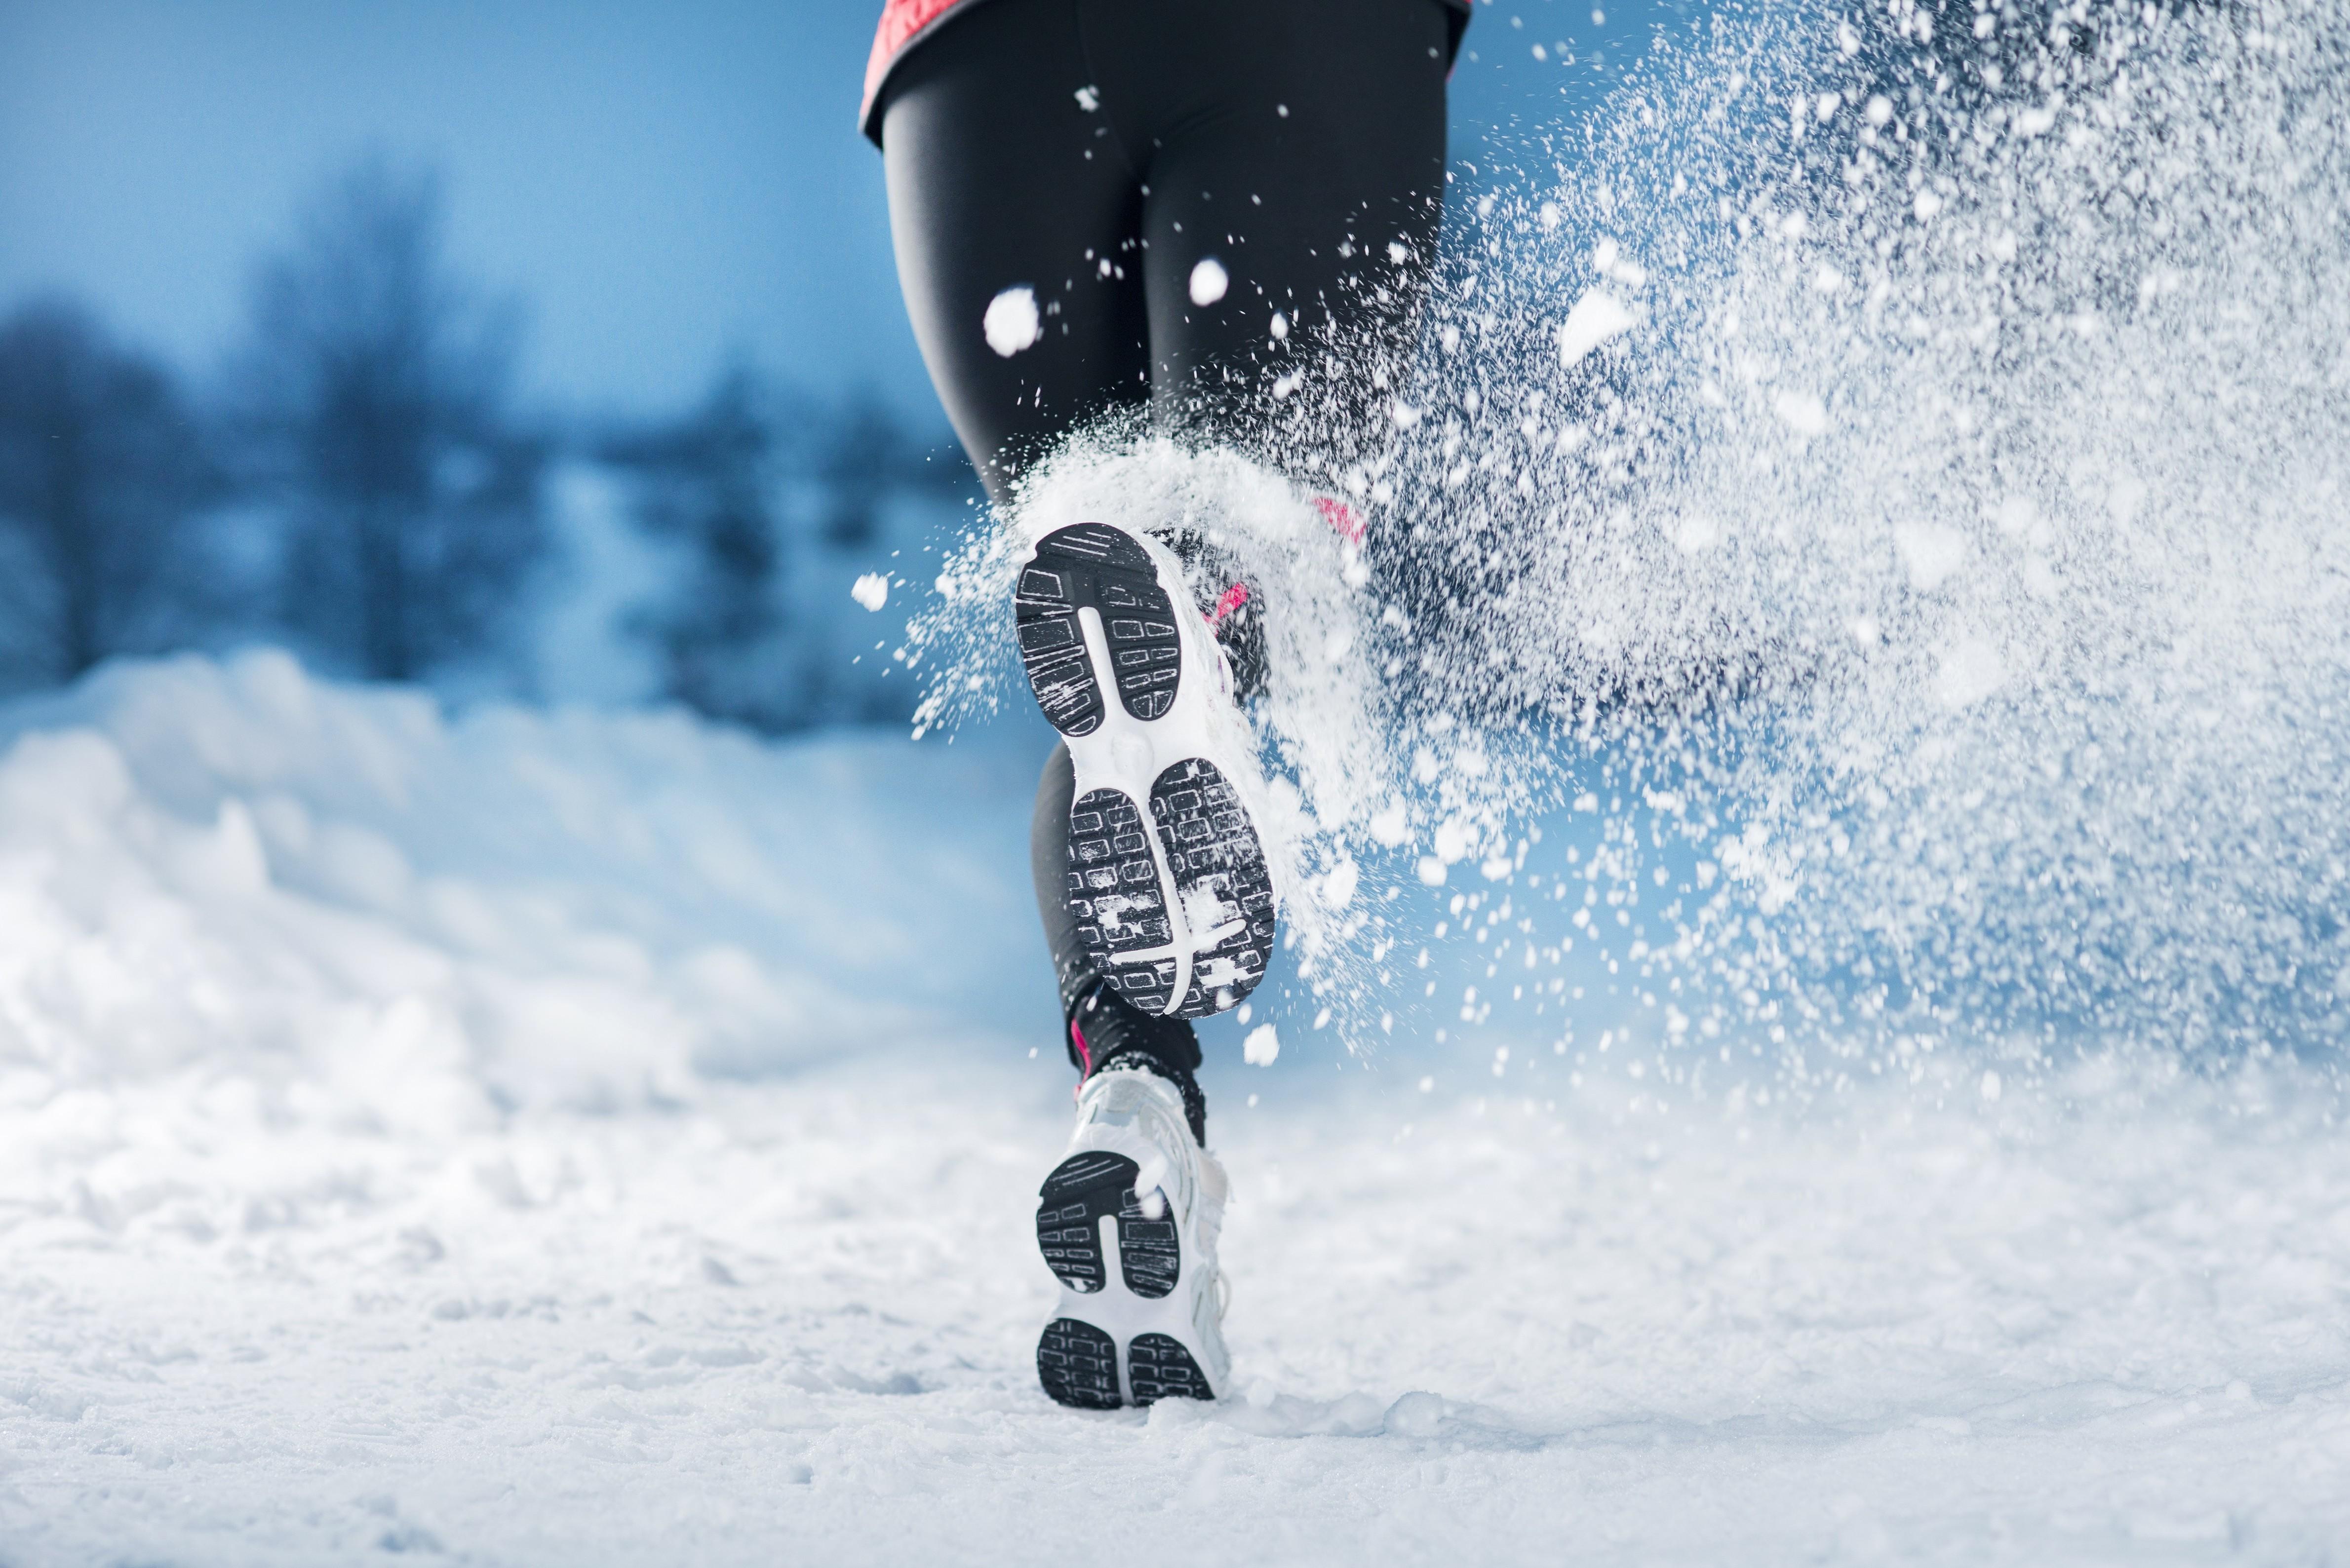 Wallpaper : Sports, Snow, Snowboarding, Snowboard, Running